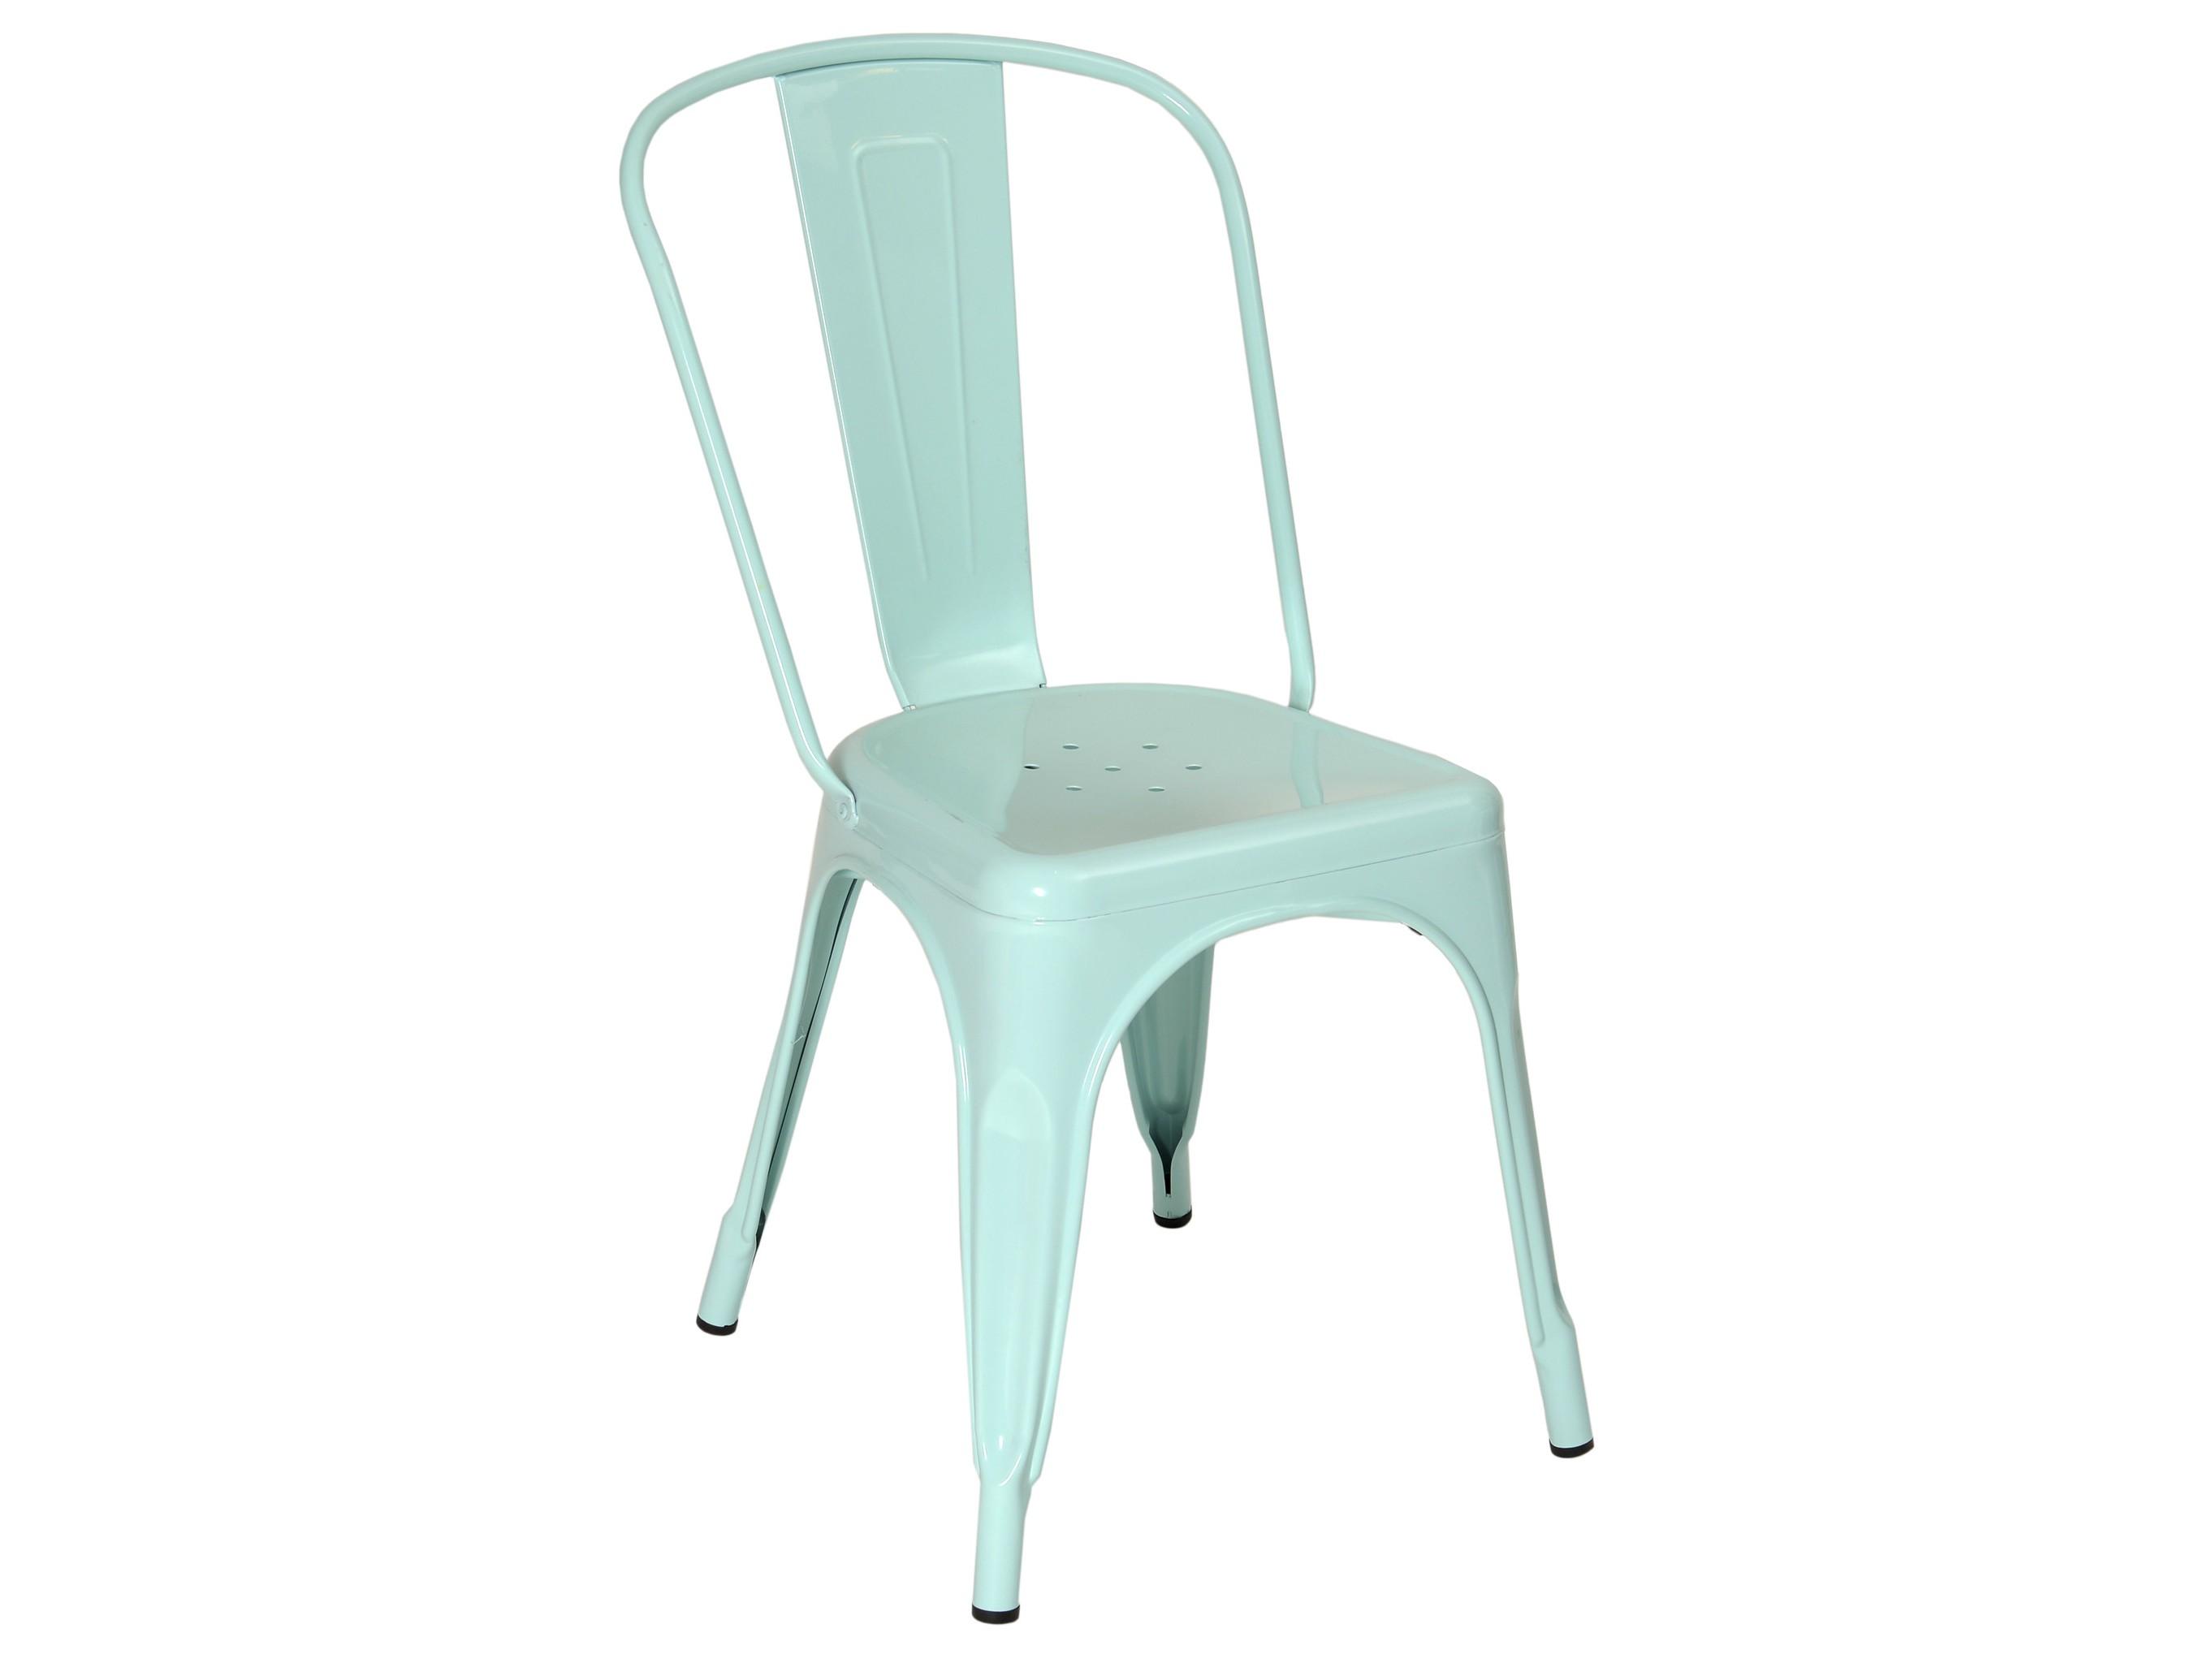 Кухонный стул To4rooms 15437727 от thefurnish